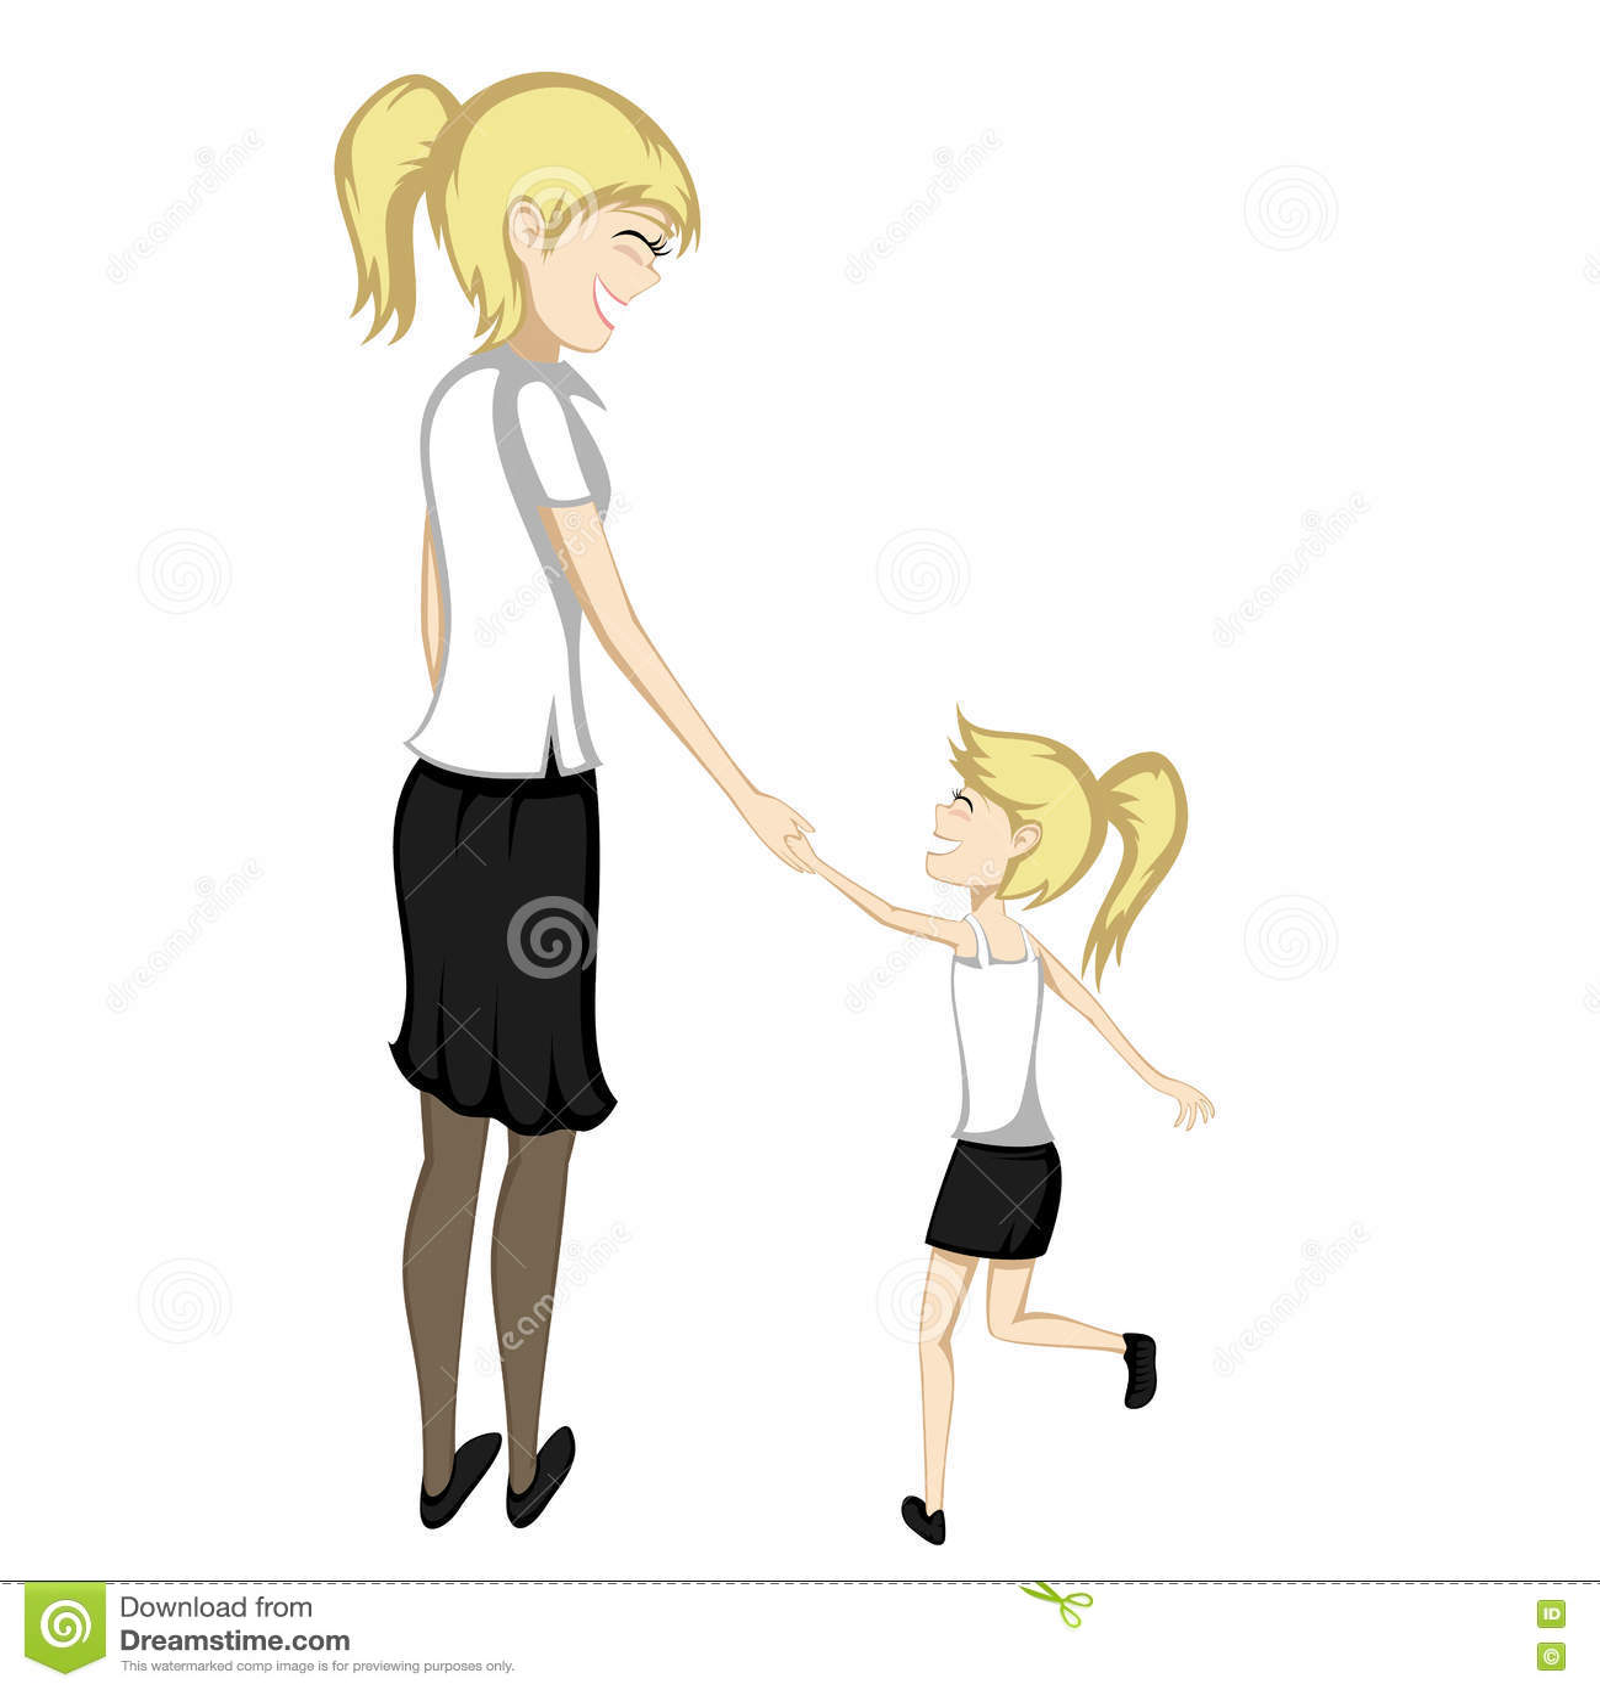 2 People Holding Hands Cartoon